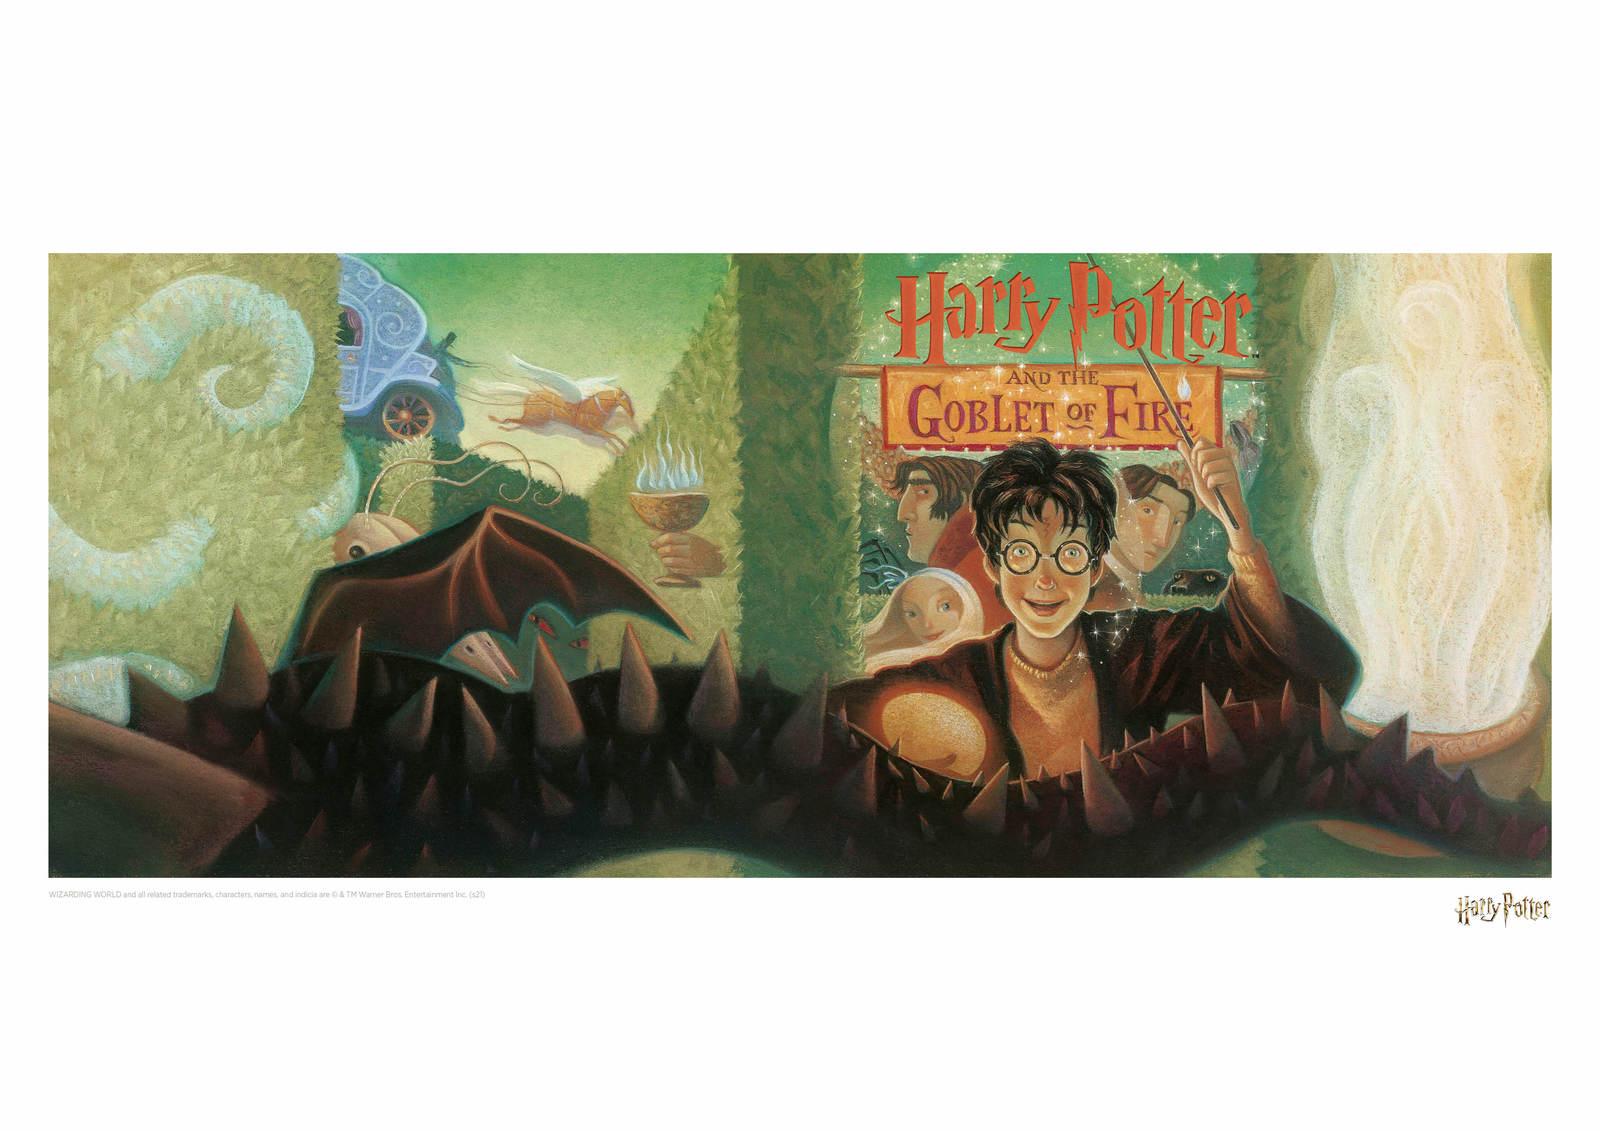 Harry Potter: Goblet of Fire - Book Cover Artwork image